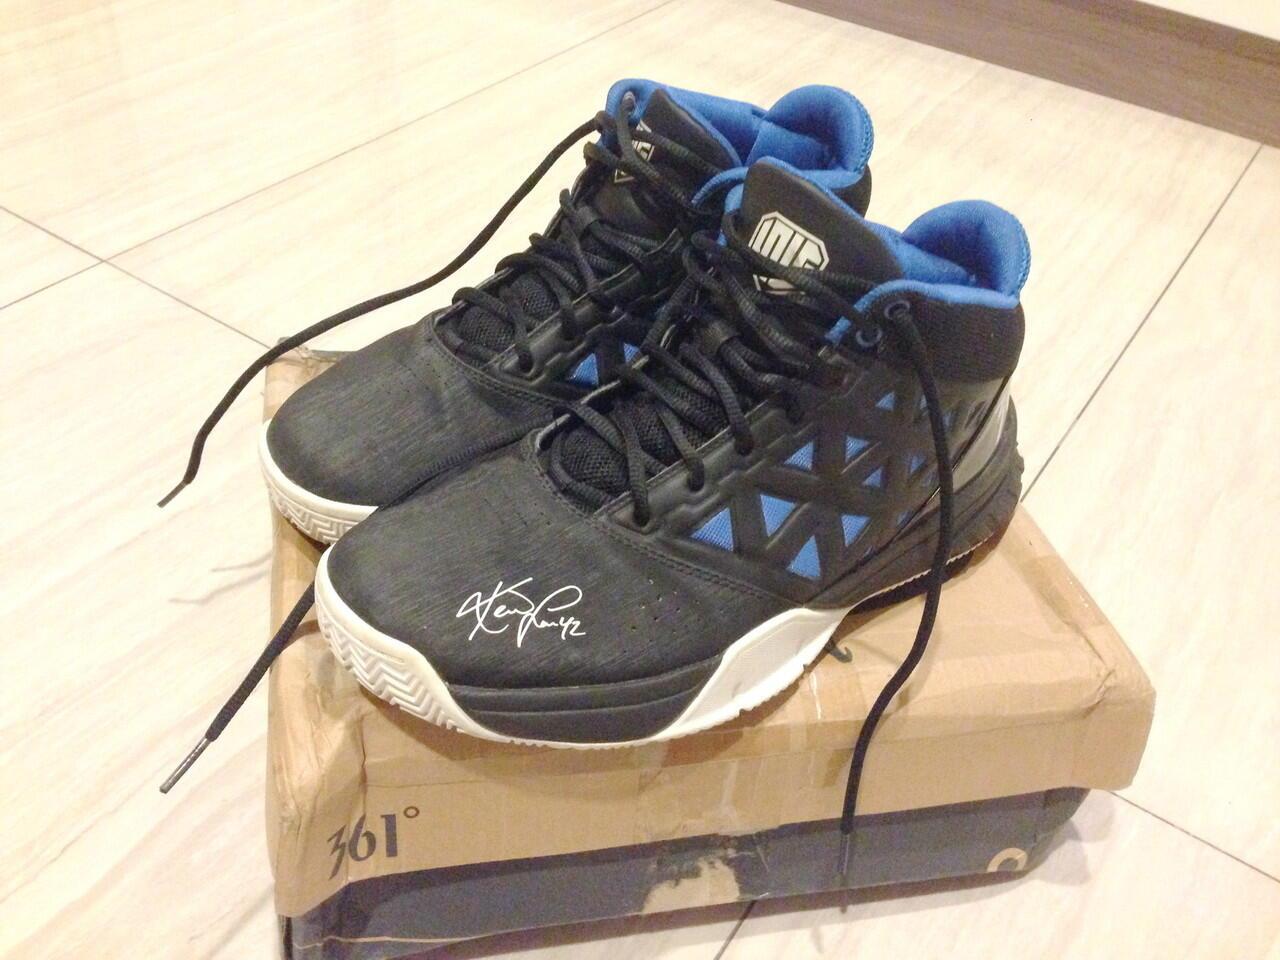 WTS Sepatu Basket 361 Kevin Love RARE ORI (Second) KOLPRI